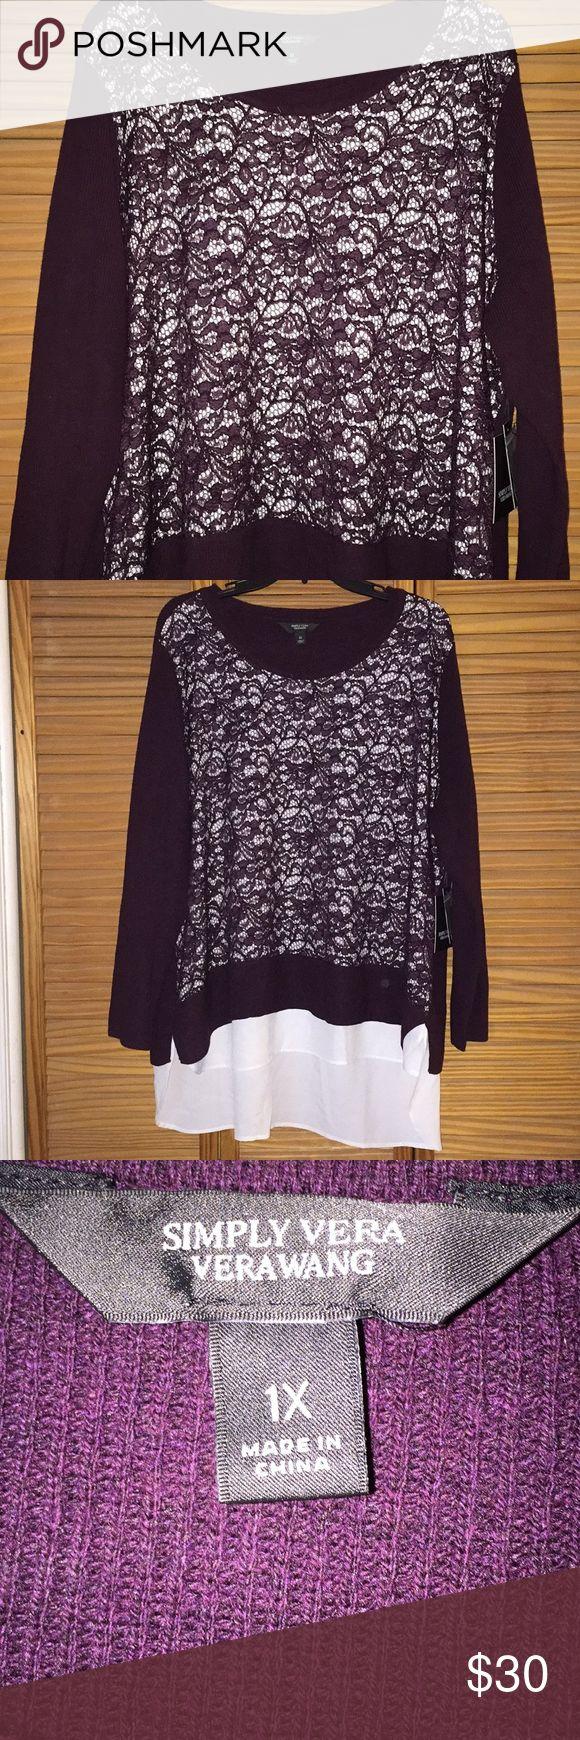 Simply Vera Vera Wang sweater Brand new, never worn. Plum colored Simply Vera sweater with white shirt tail. Simply Vera Vera Wang Sweaters Crew & Scoop Necks